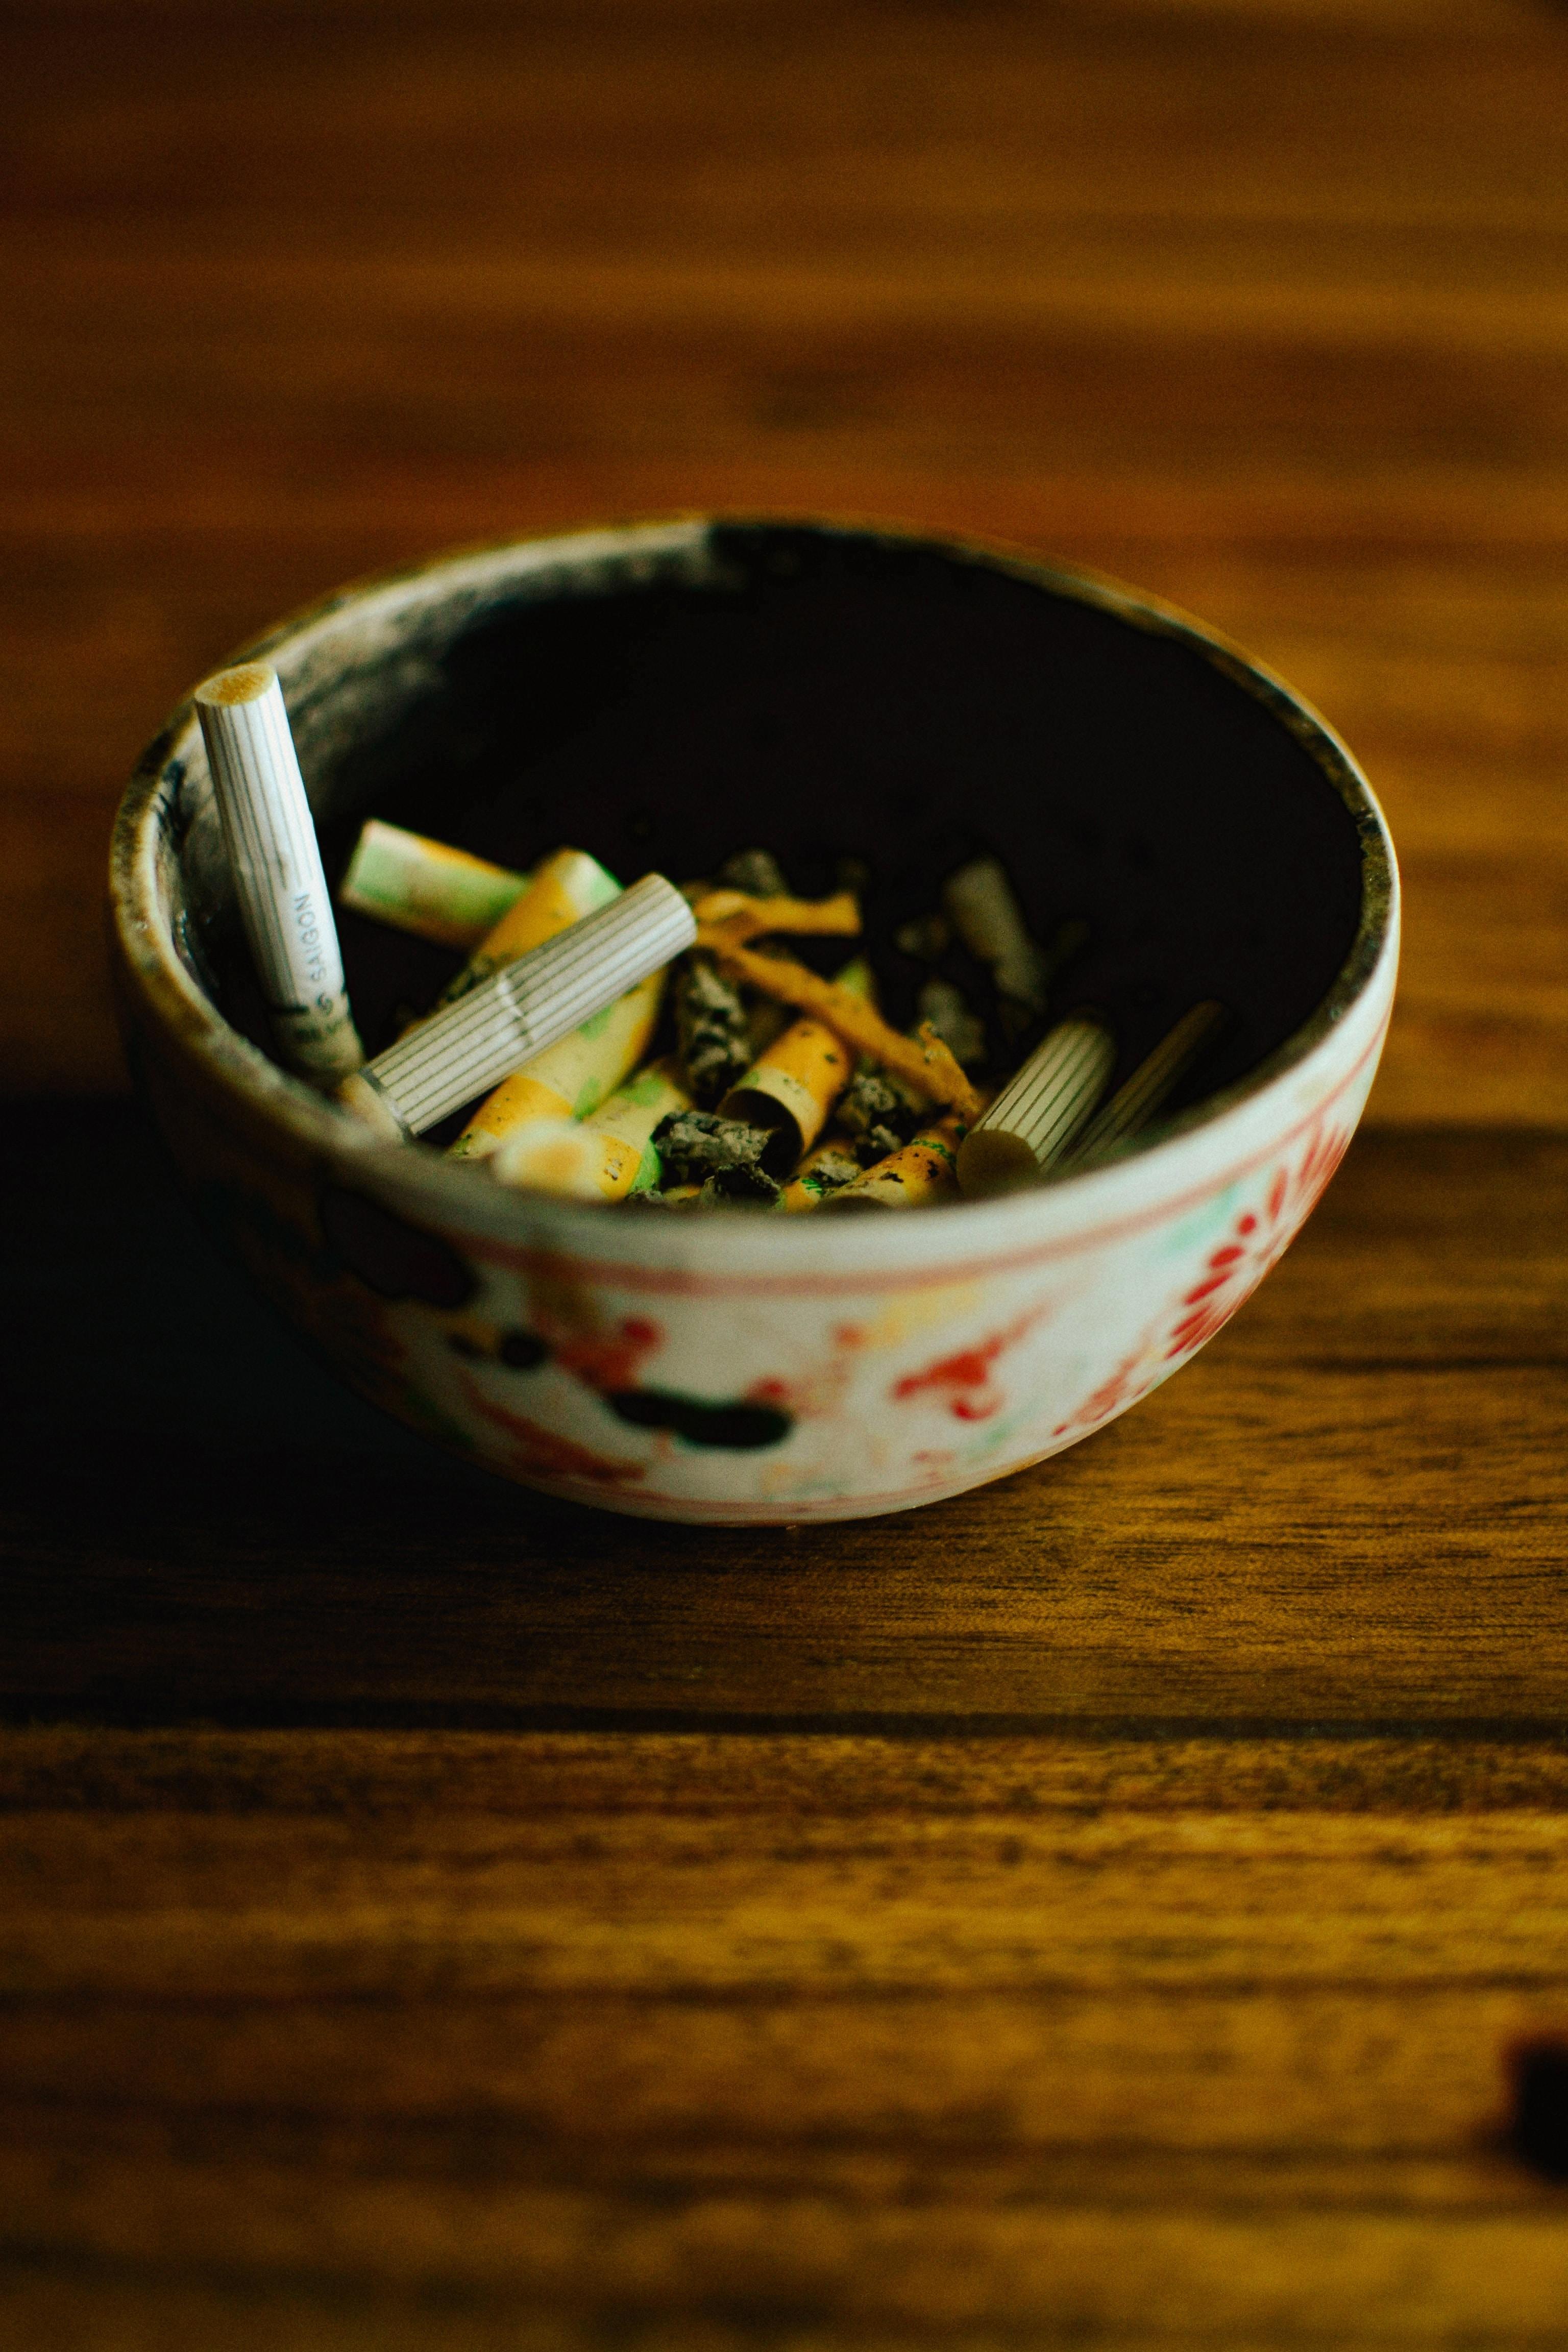 cigarette butts in white ashtray